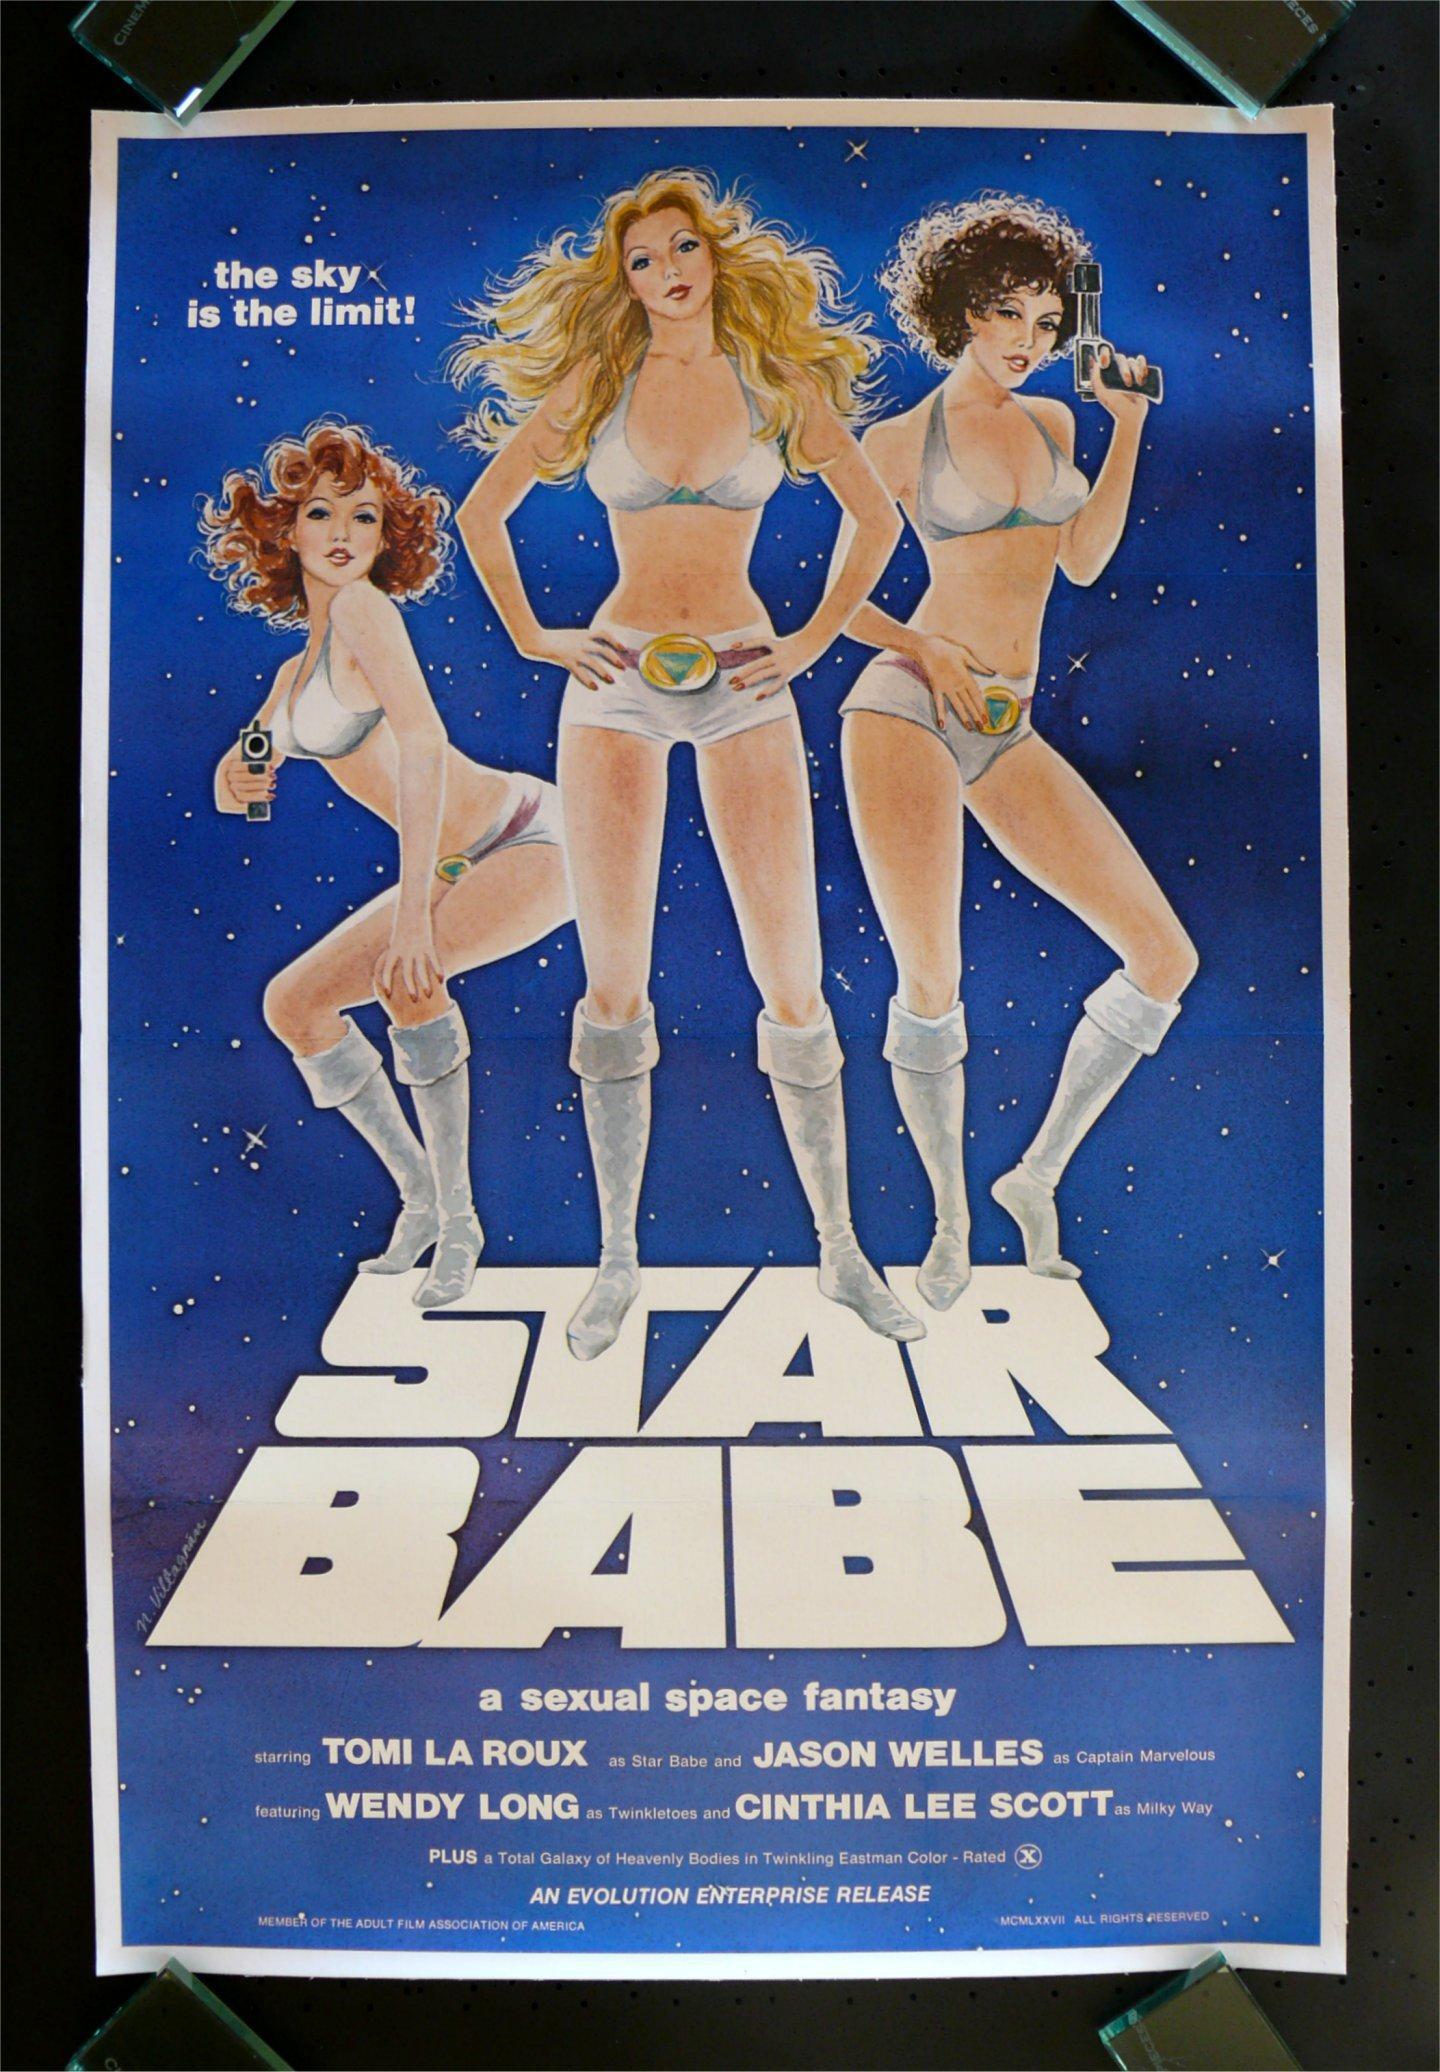 STAR BABE